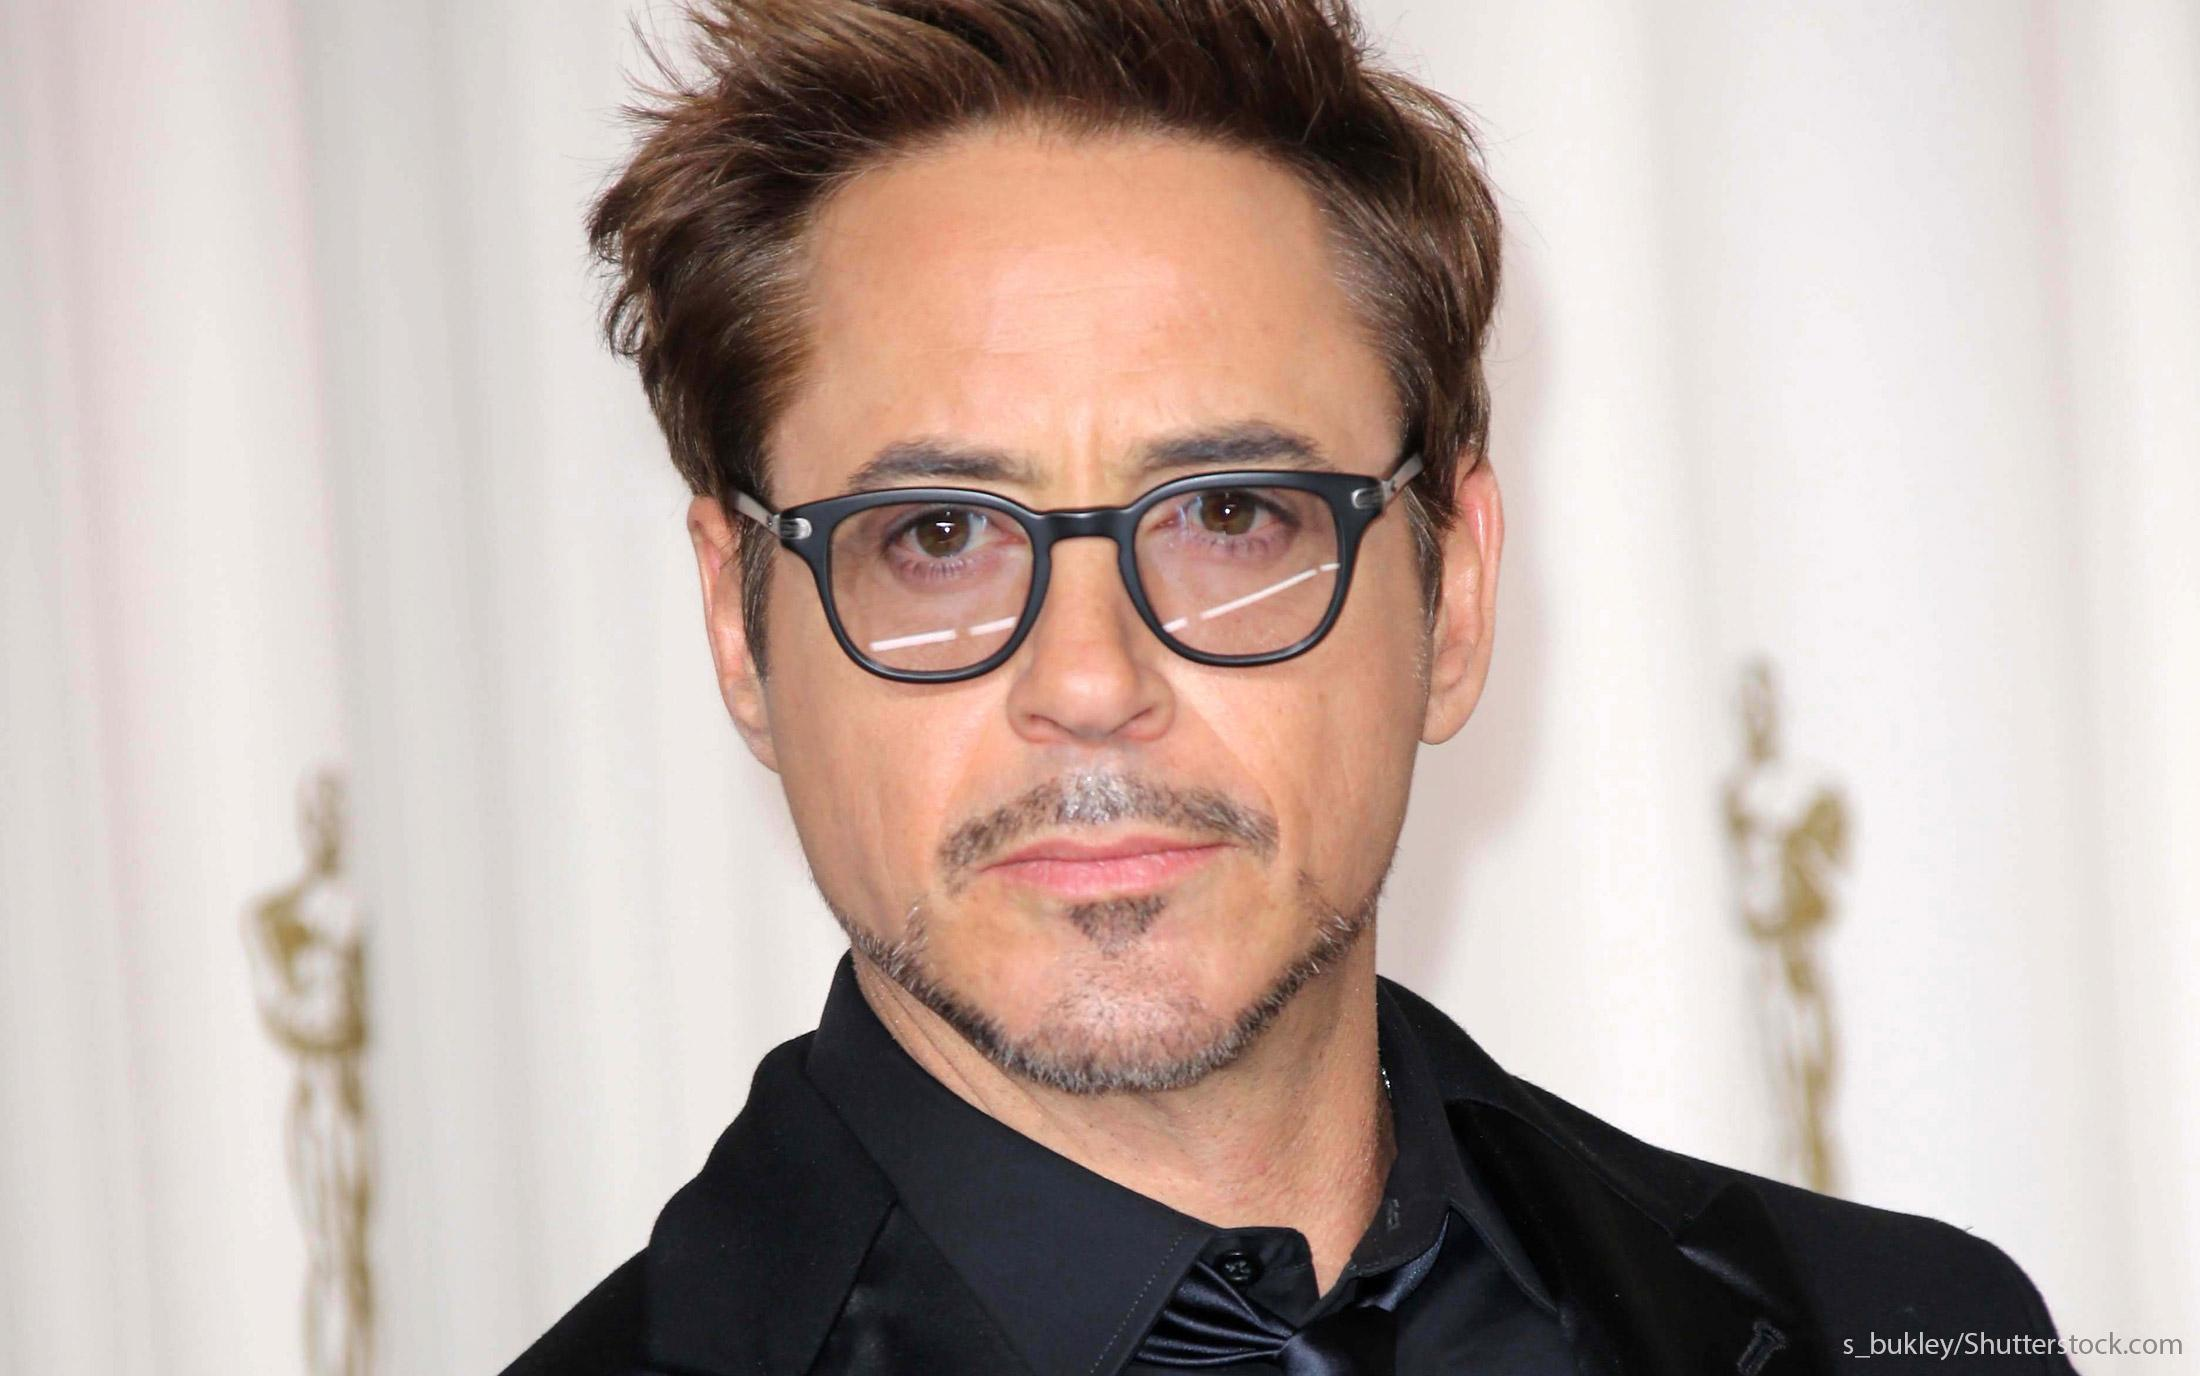 Robert Downey Jr.'s net worth